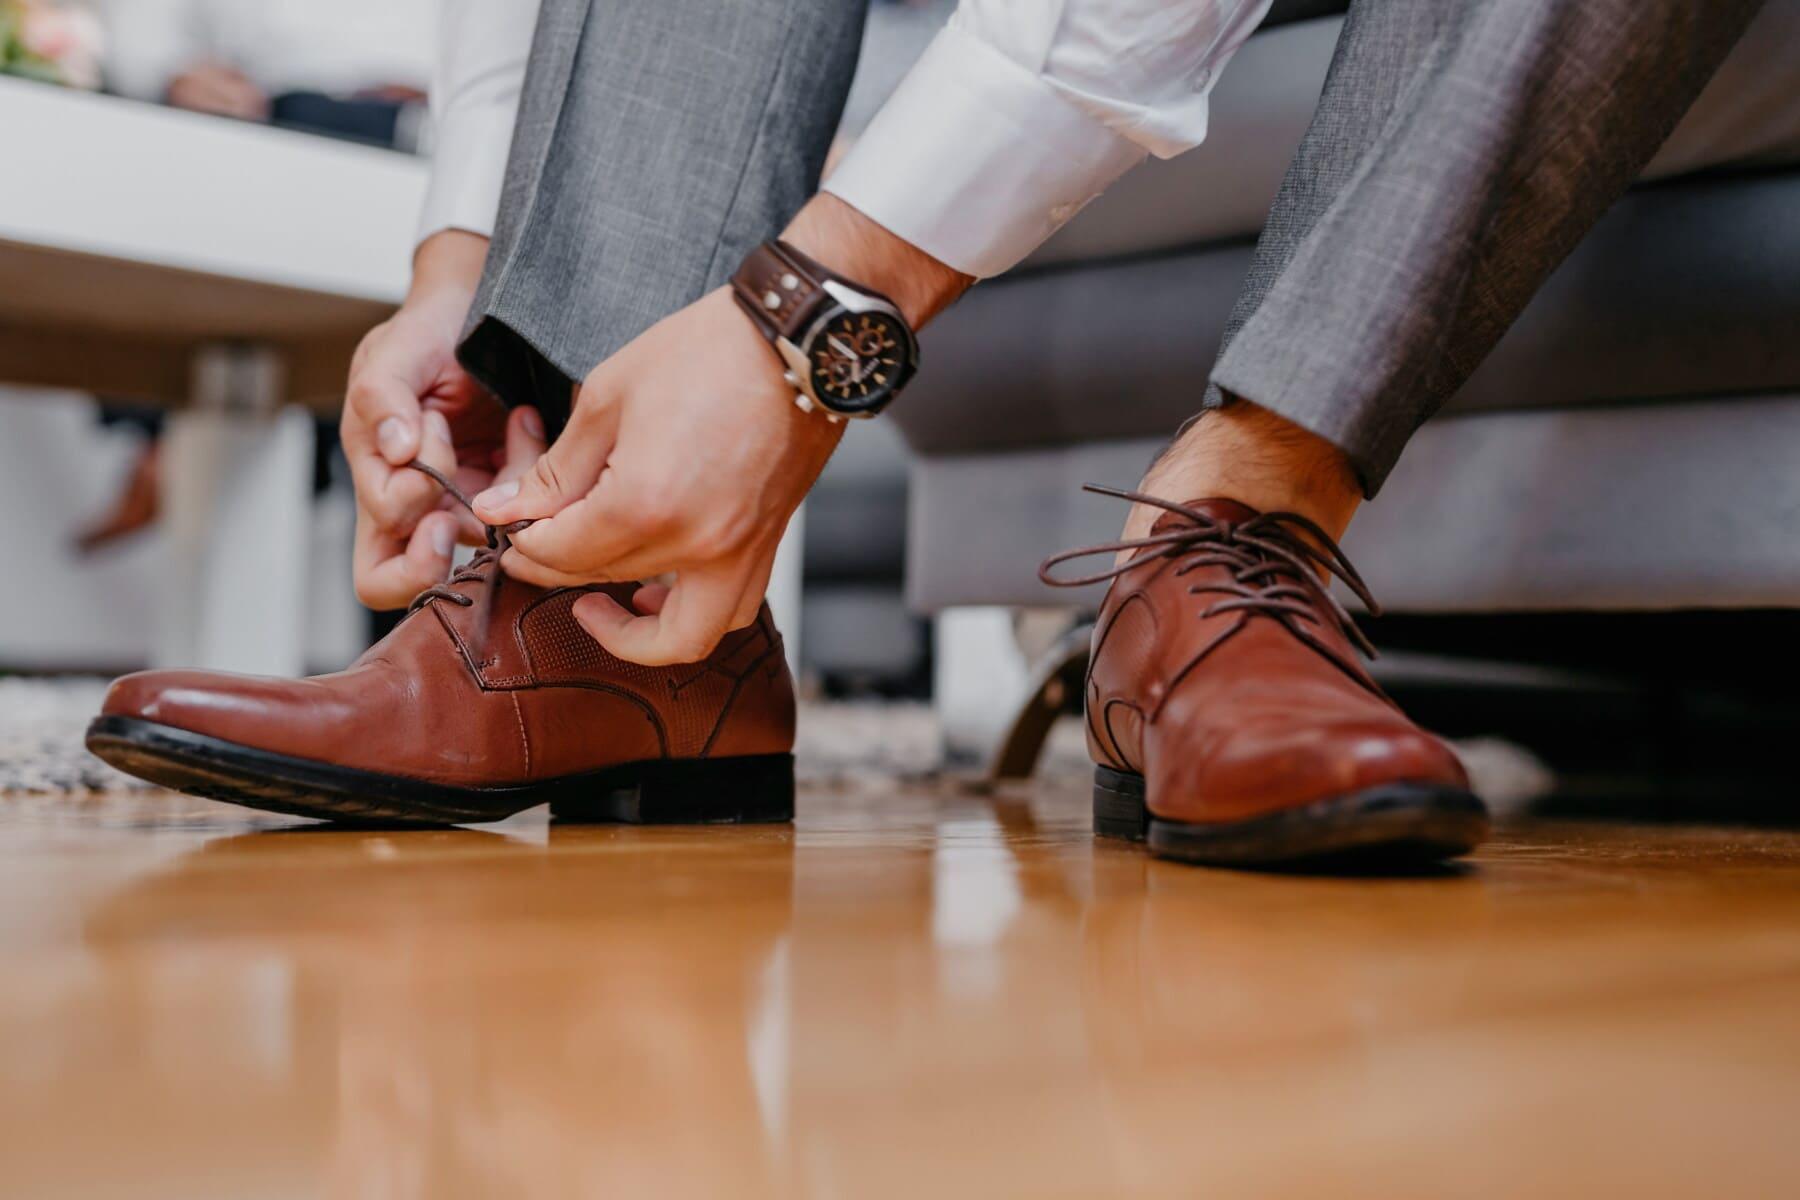 jambes, pieds nus, chaussures, lacet, pied, chaussures, professionnel, fantaisie, homme, en cuir